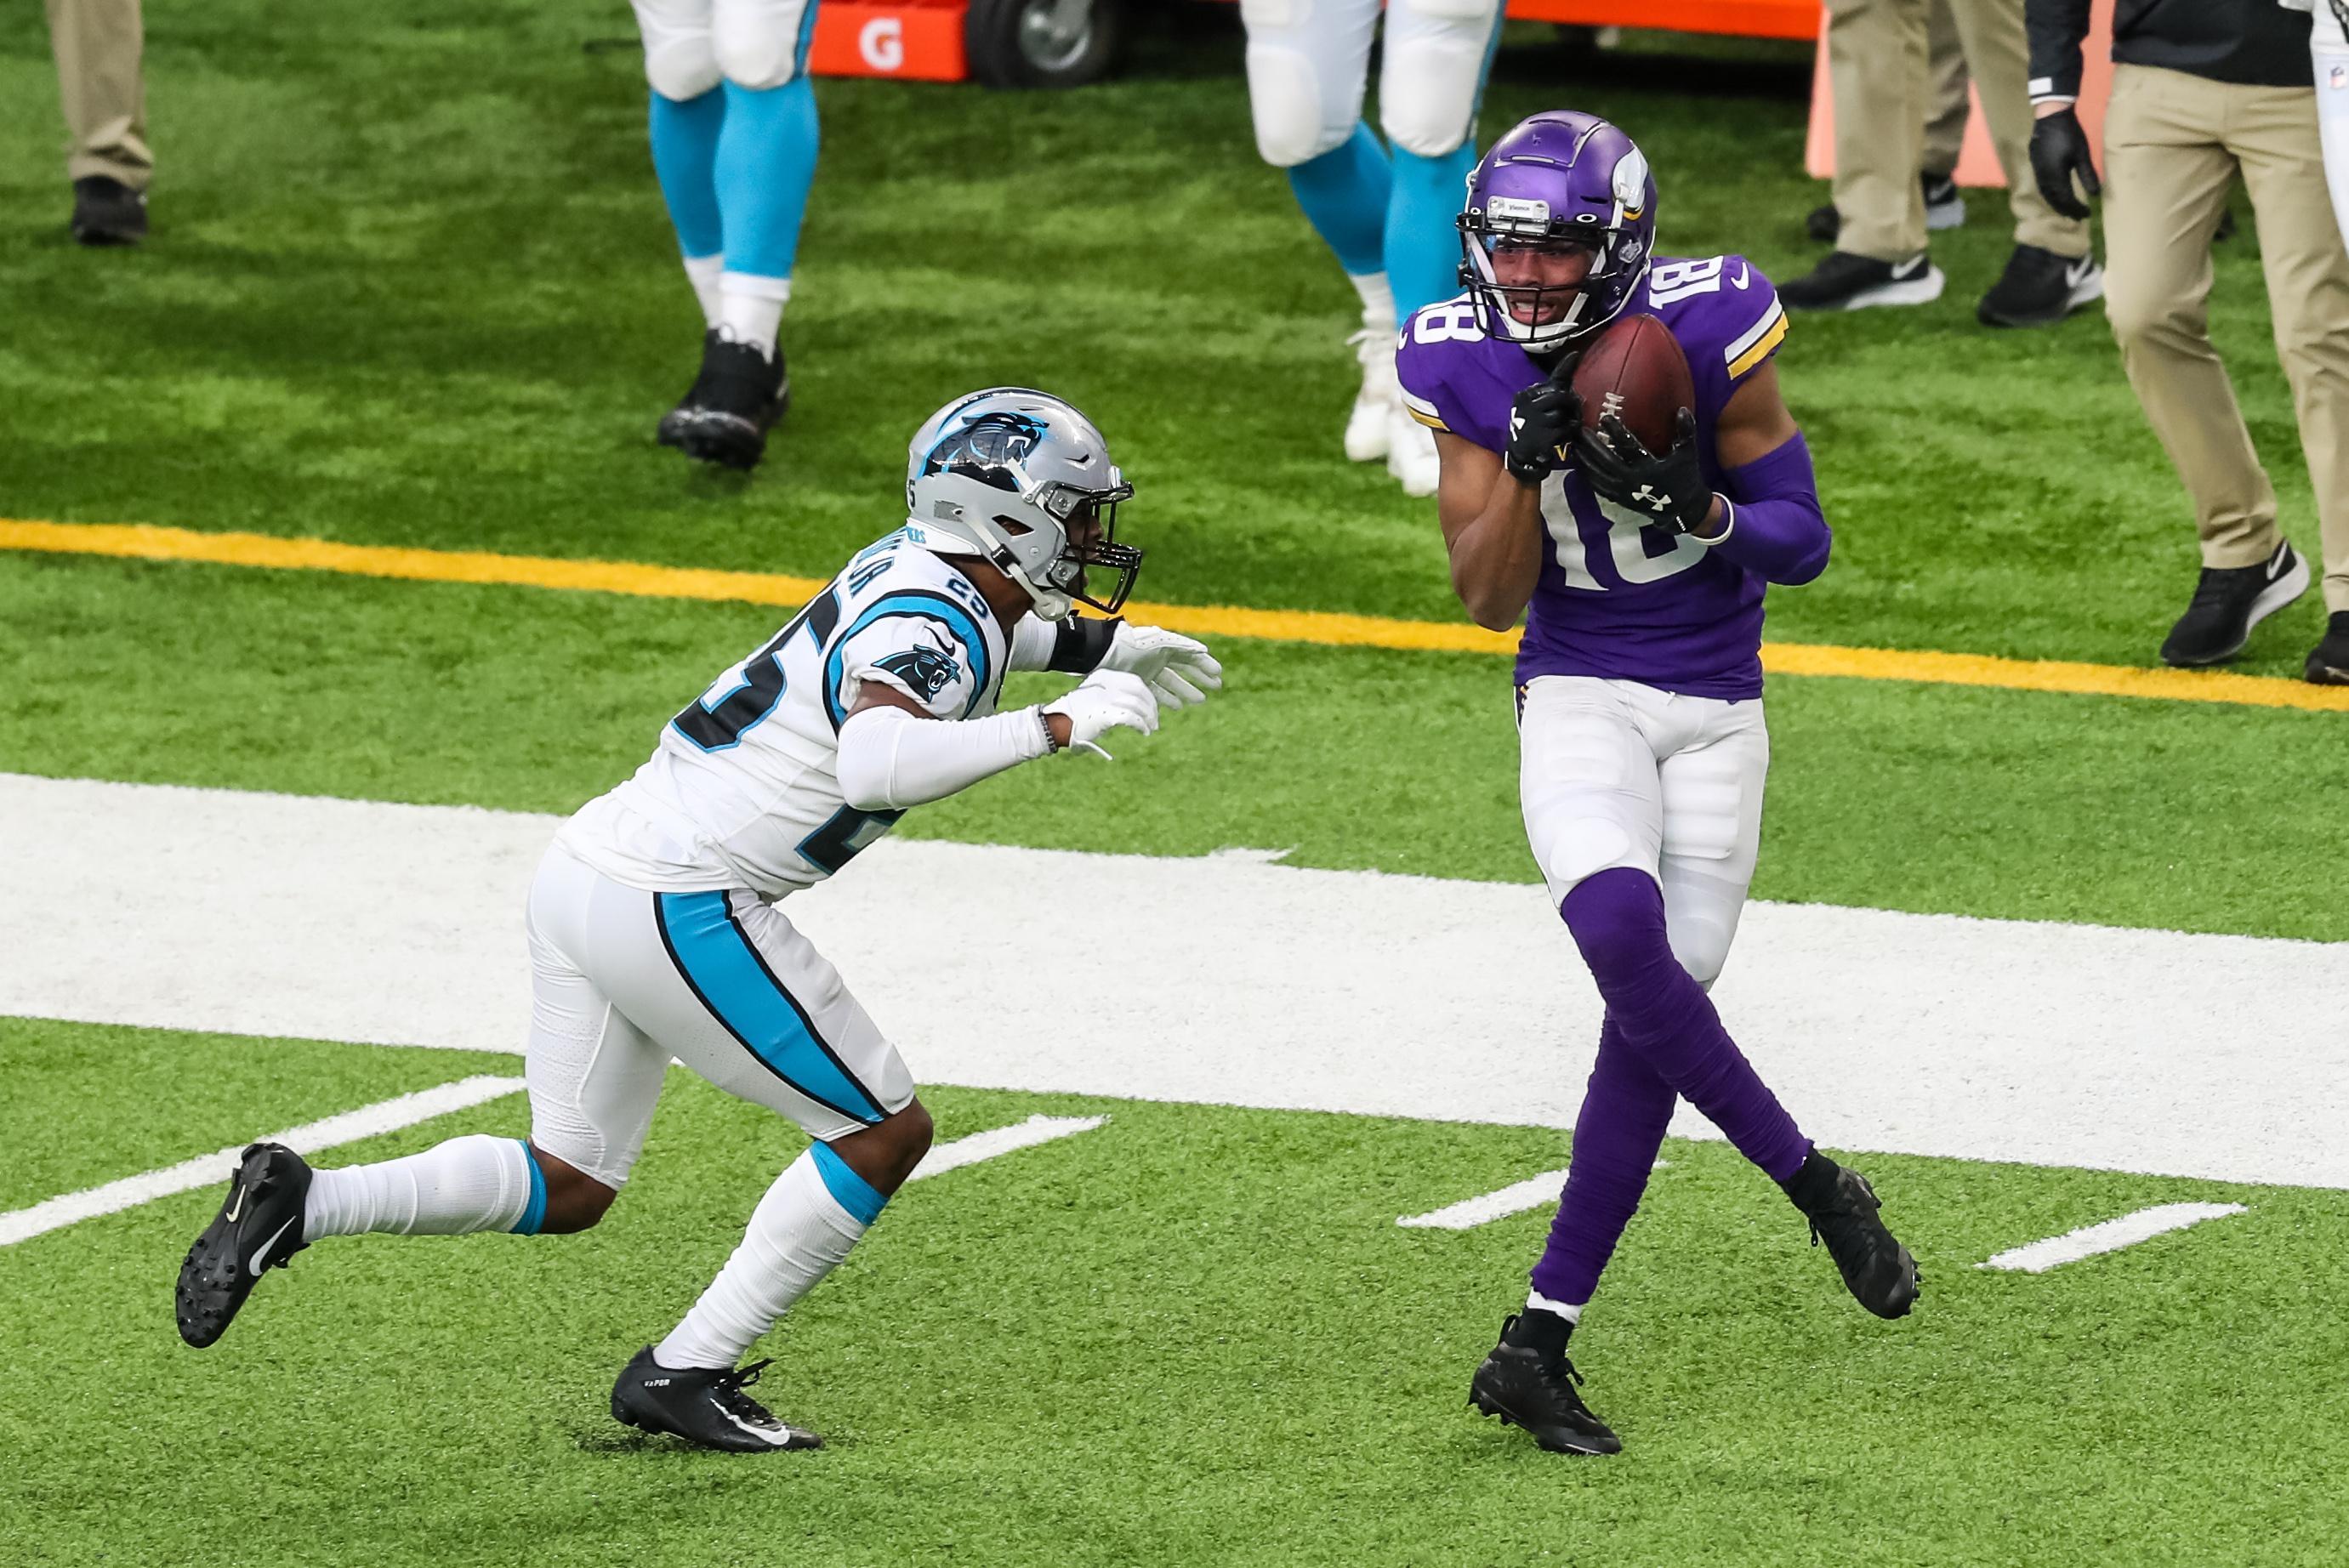 NFL: Carolina Panthers at Minnesota Vikings